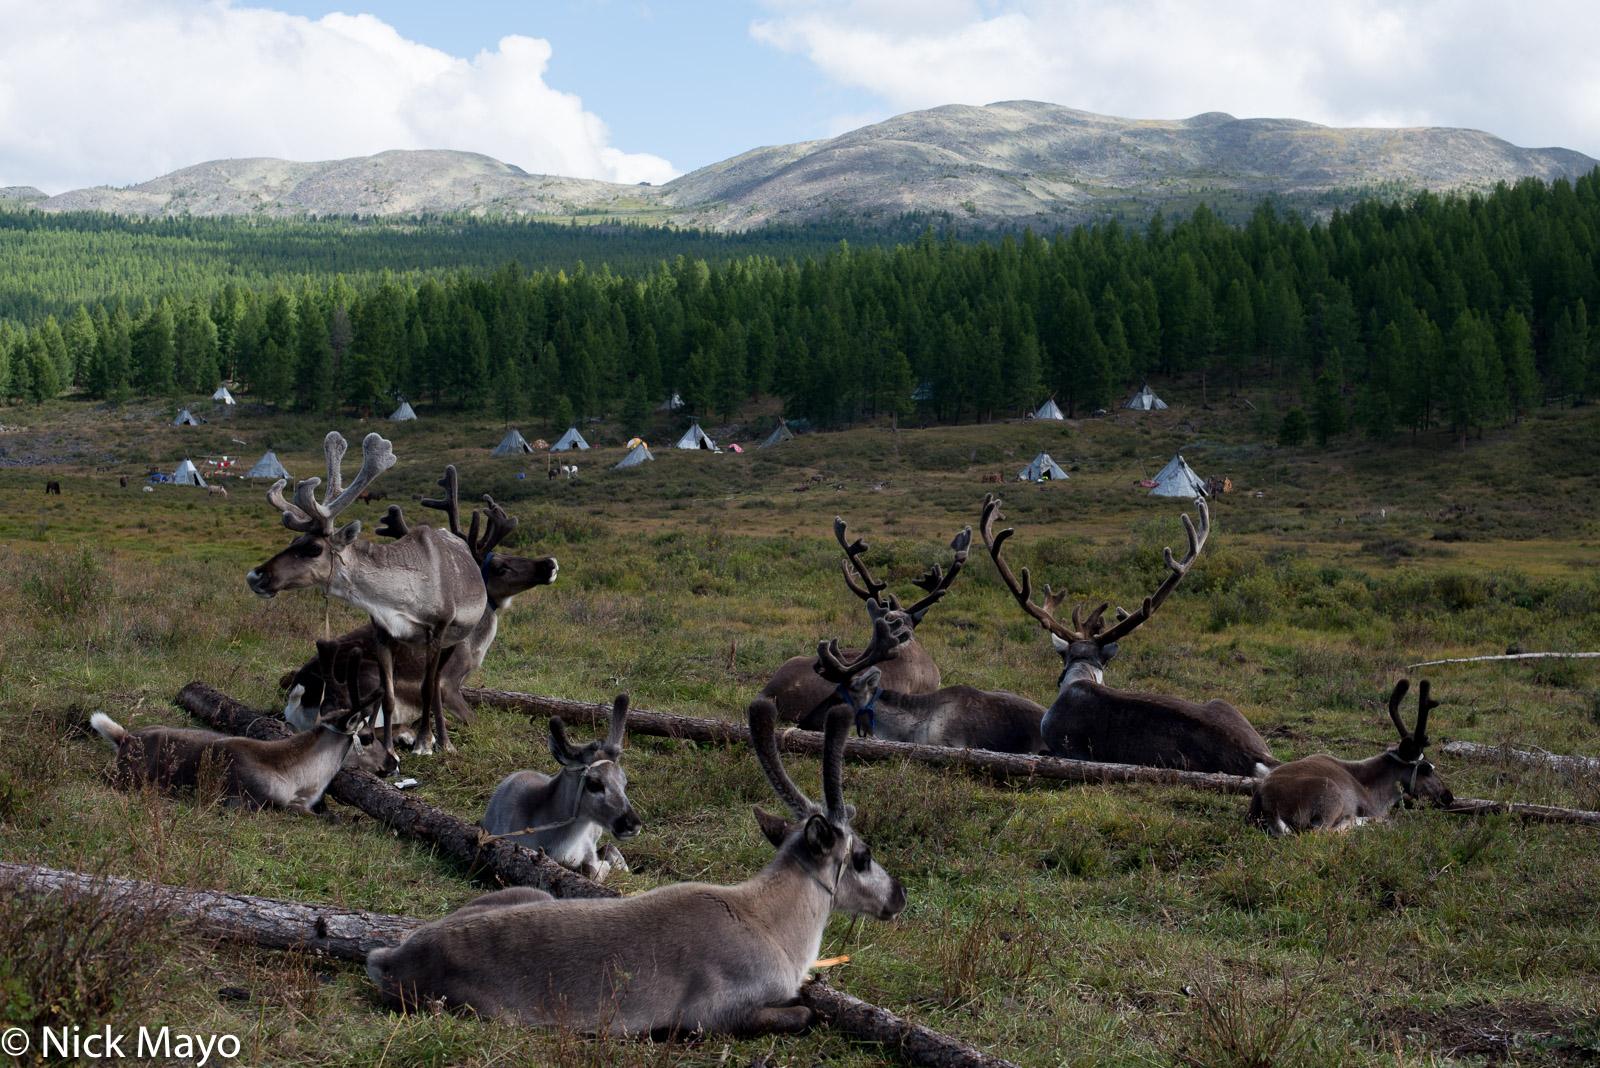 Khovsgol, Mongolia, Reindeer, Tent, photo